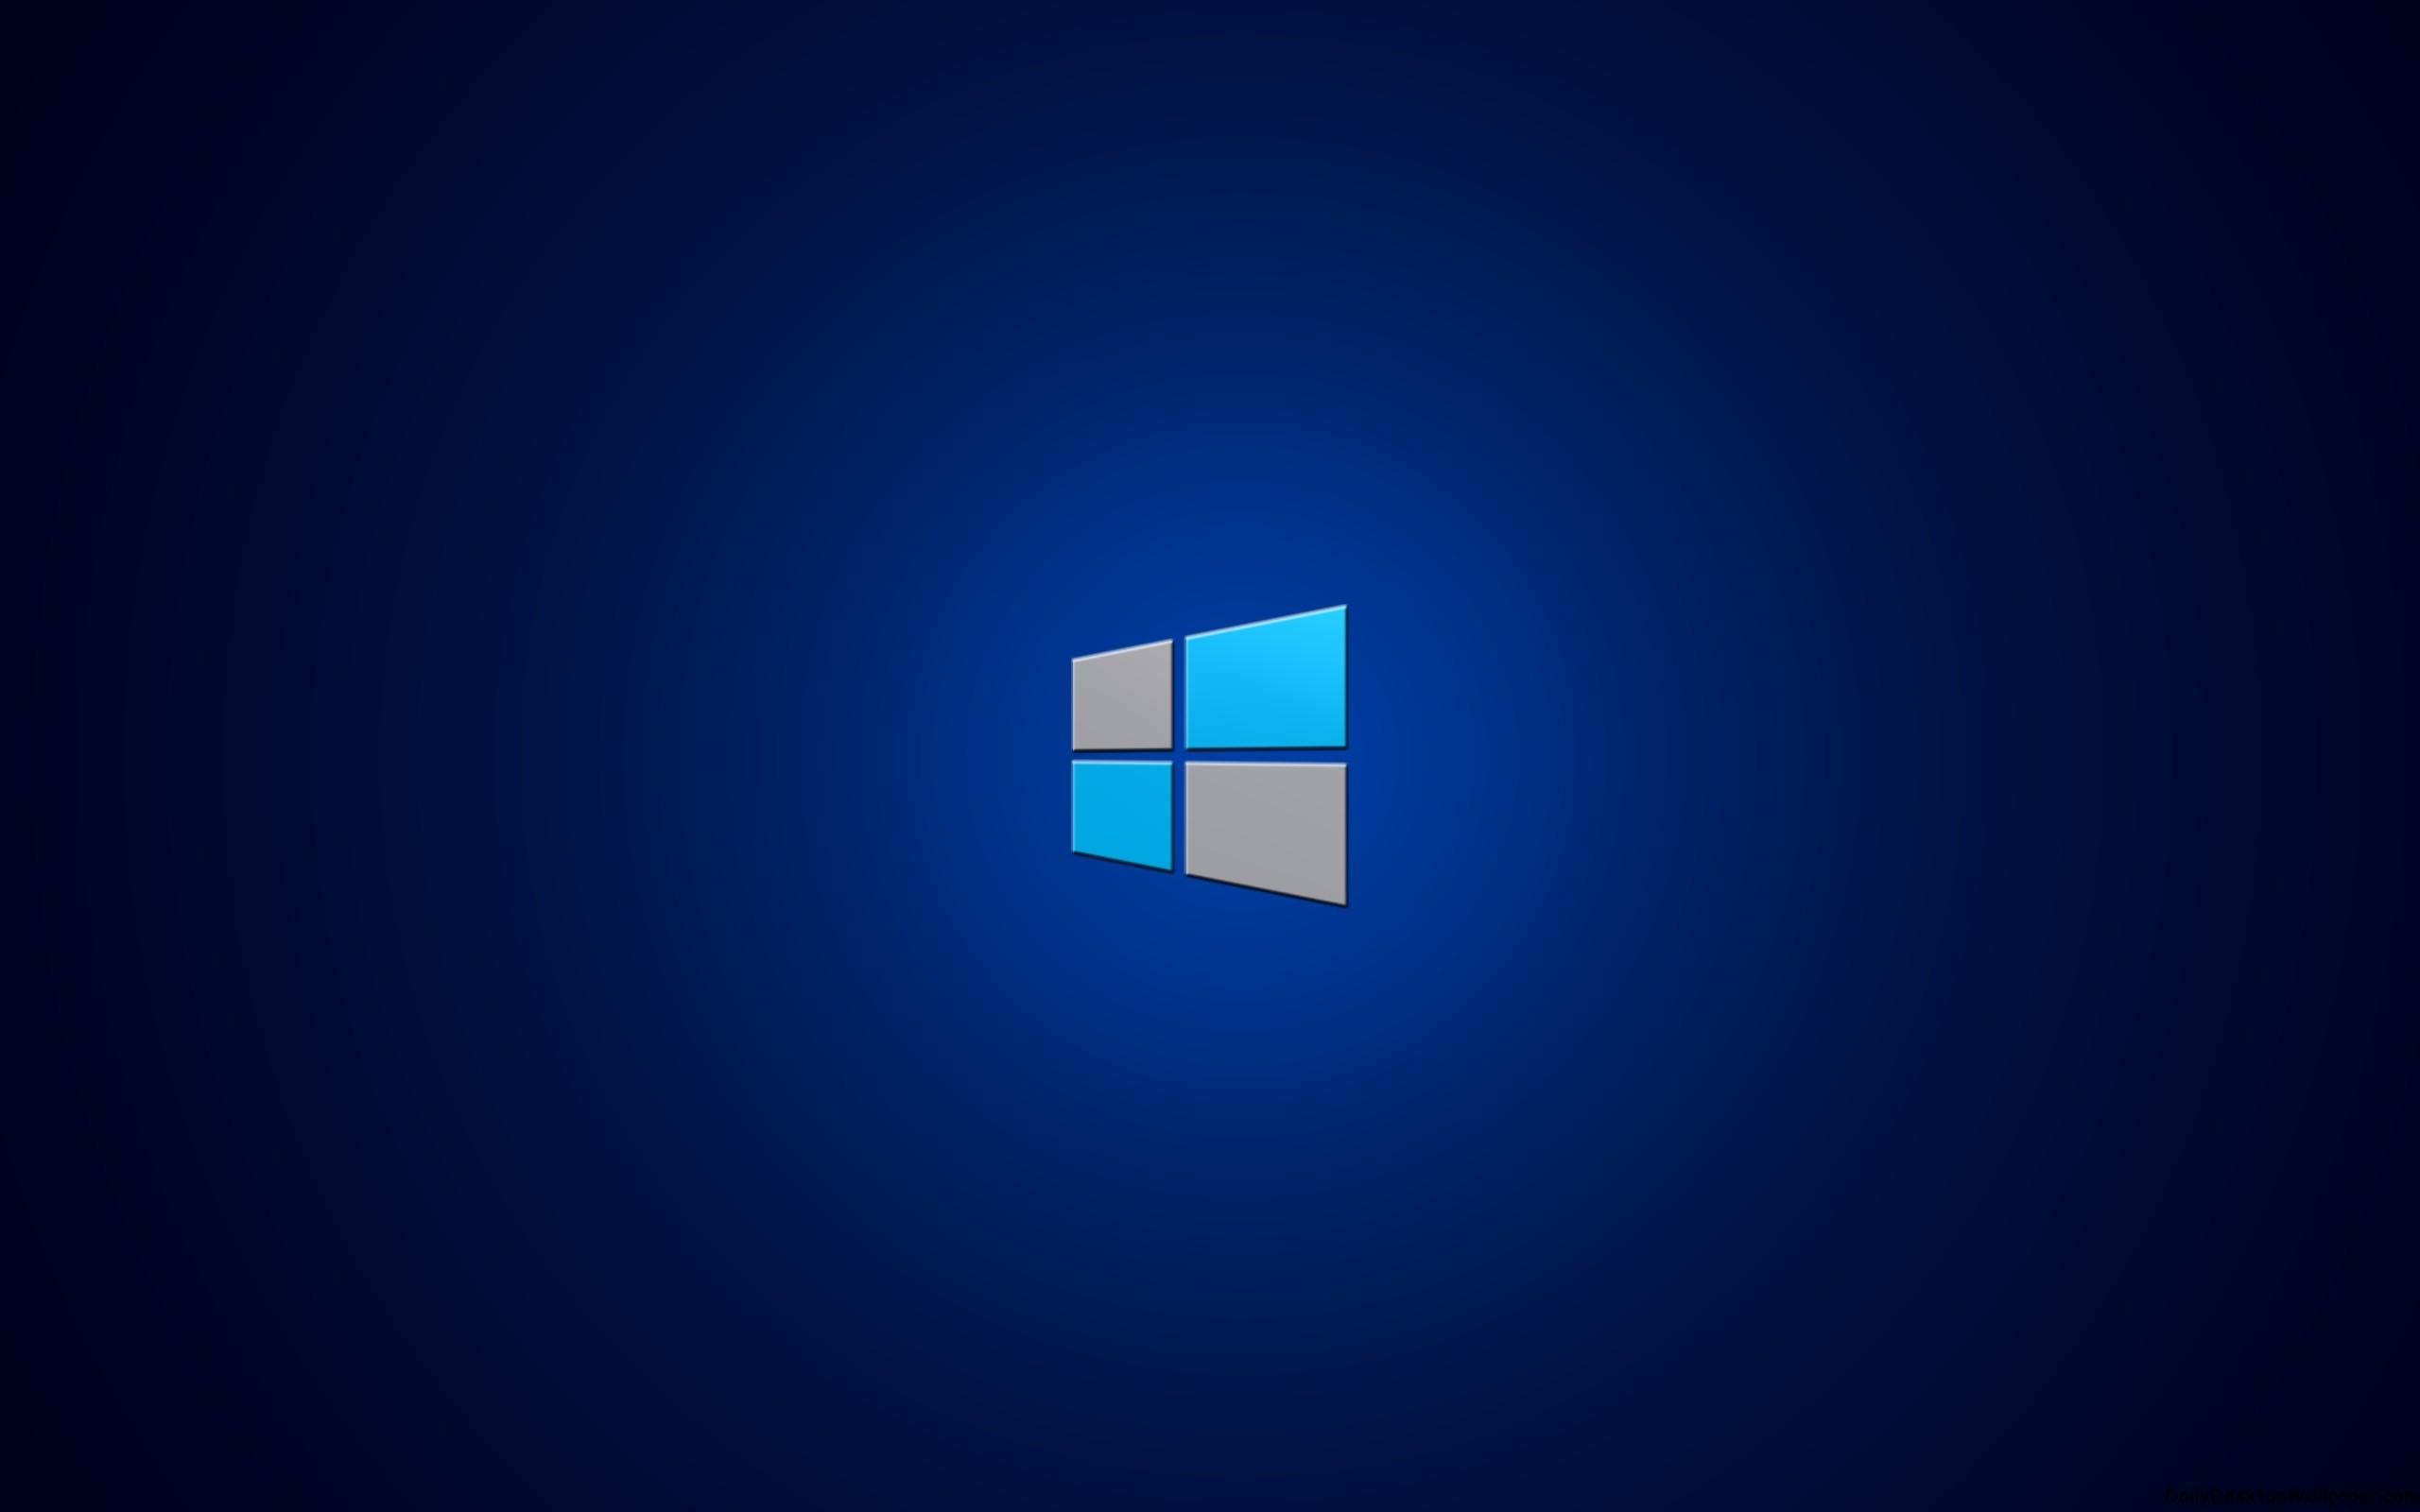 Two Blue Windows